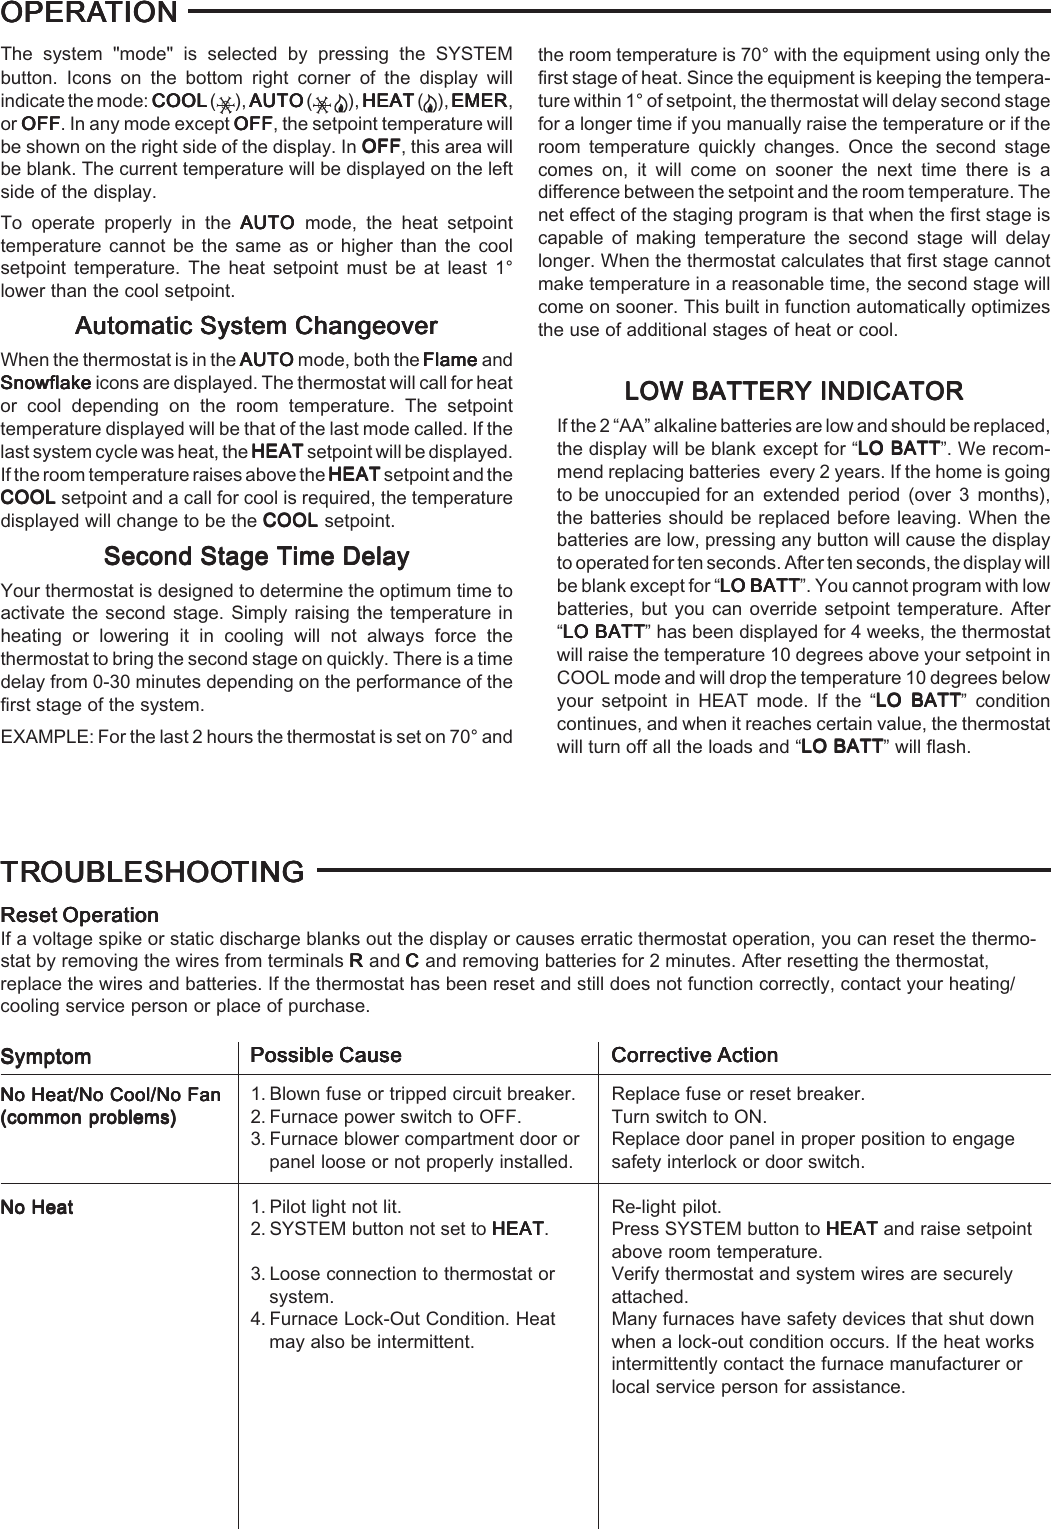 Emerson 1F83 277 Users Manual 1F83_277_37_6509E_changed P65